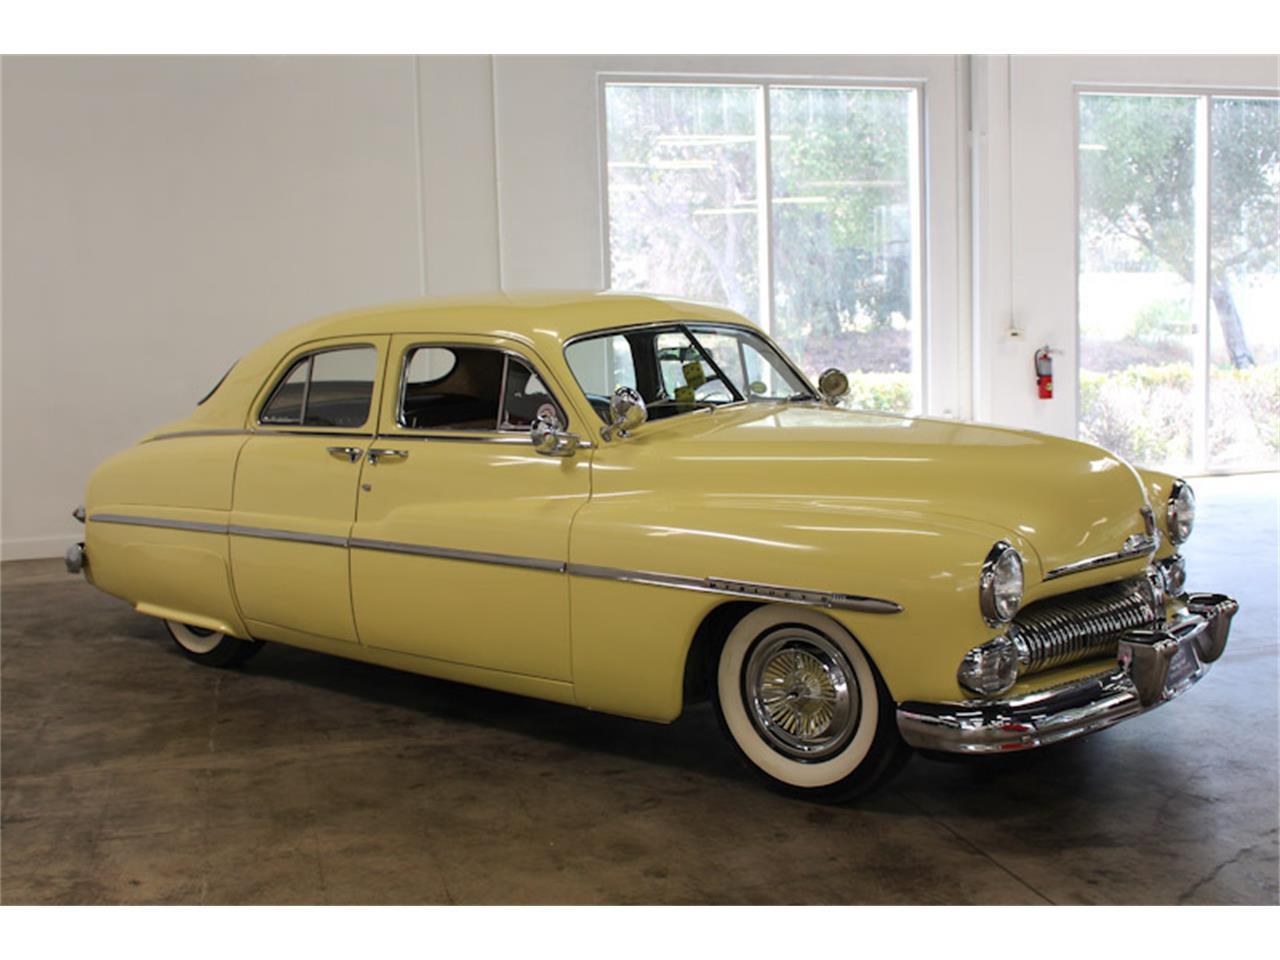 Large Picture of Classic '50 Mercury Hot Rod located in Fairfield California - $29,990.00 - OJFQ